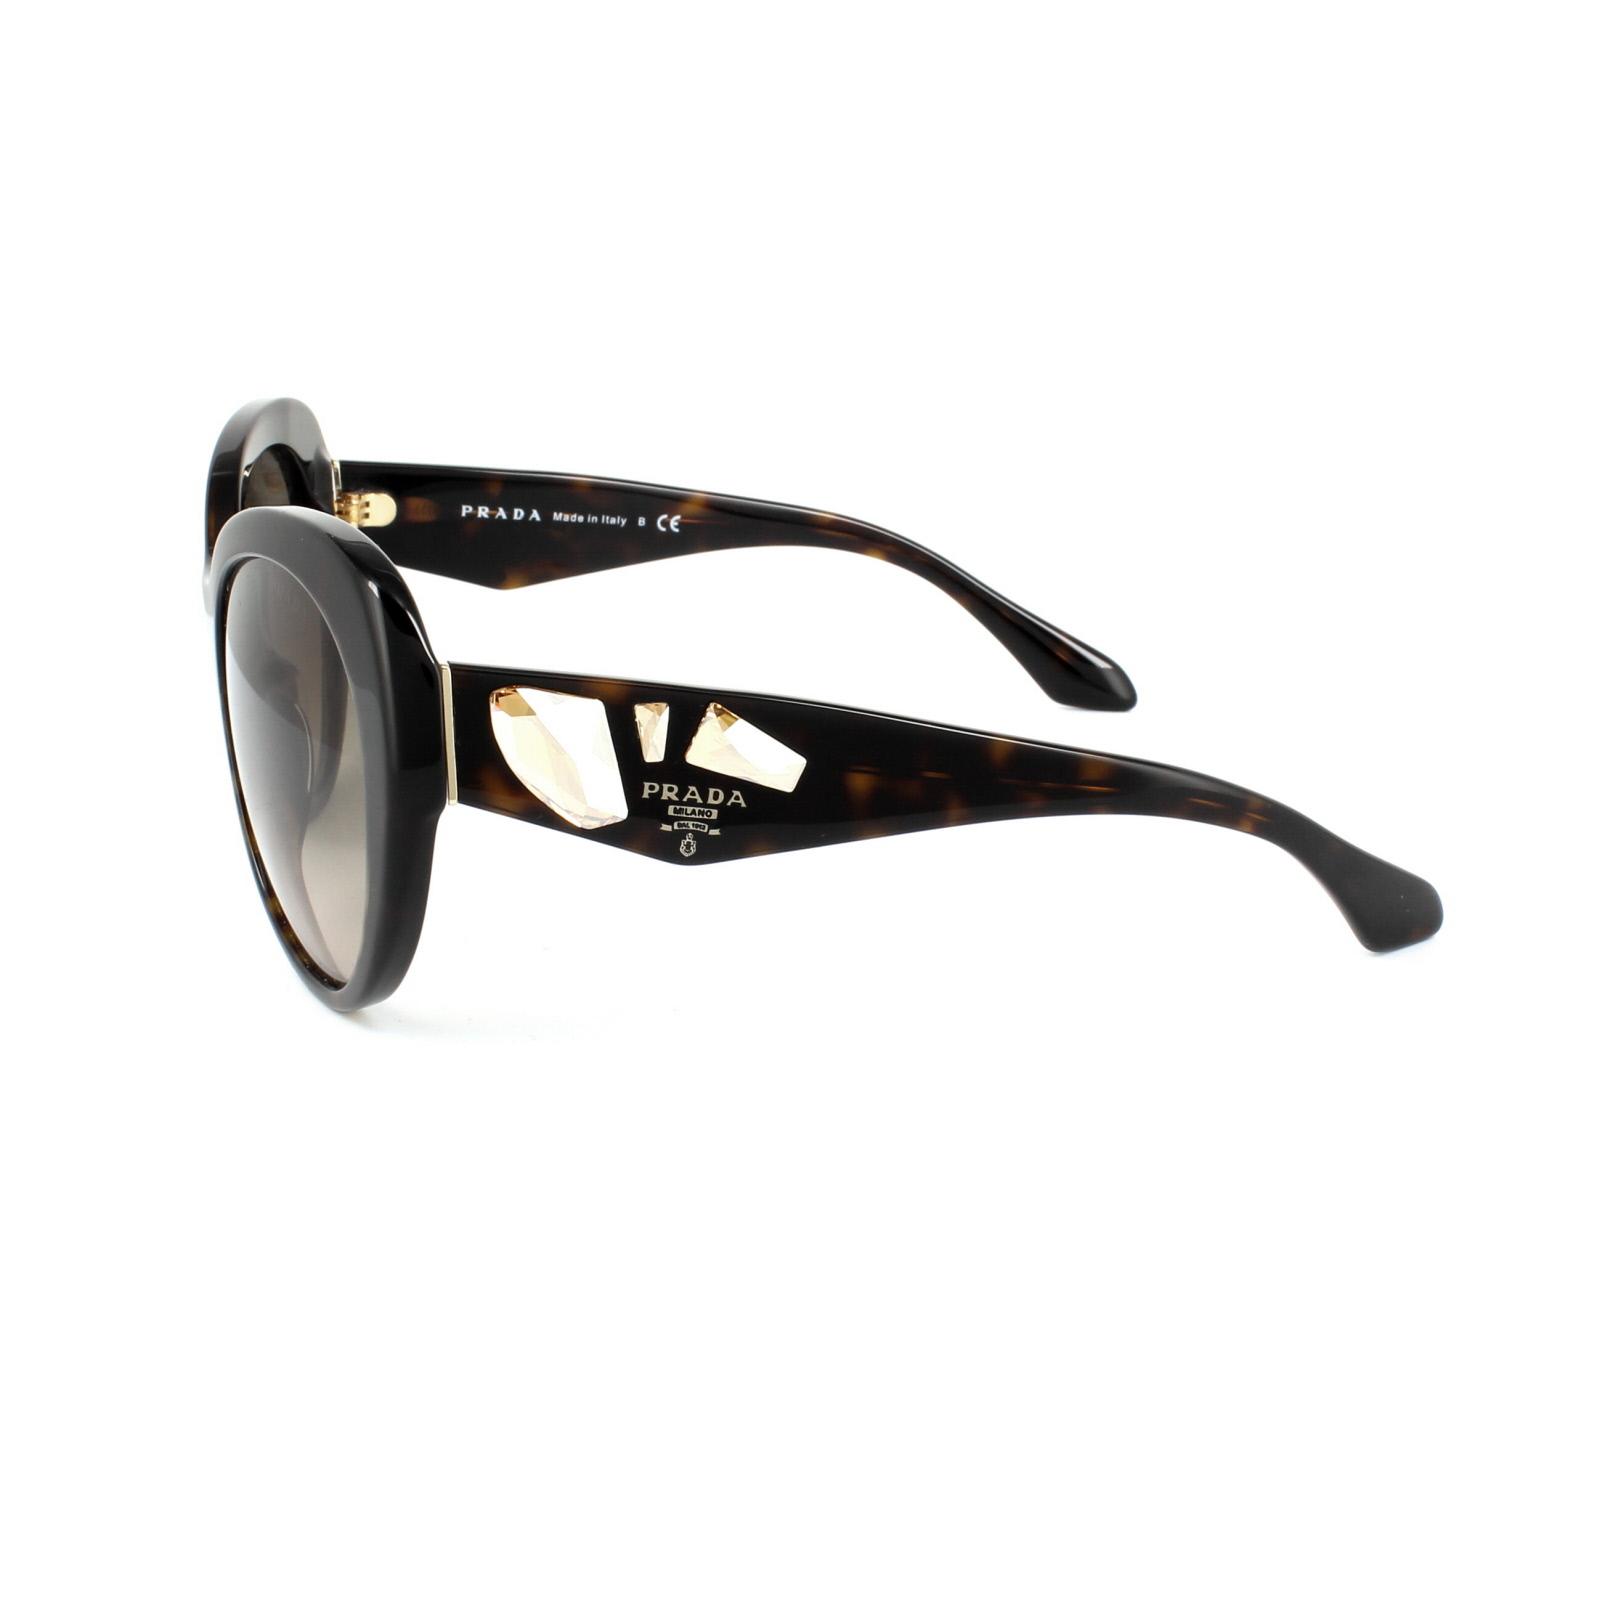 060333cd5d0 low price sentinel prada sunglasses 26qs 2au3d0 dark havana light brown  grey gradient d6a1b c2538